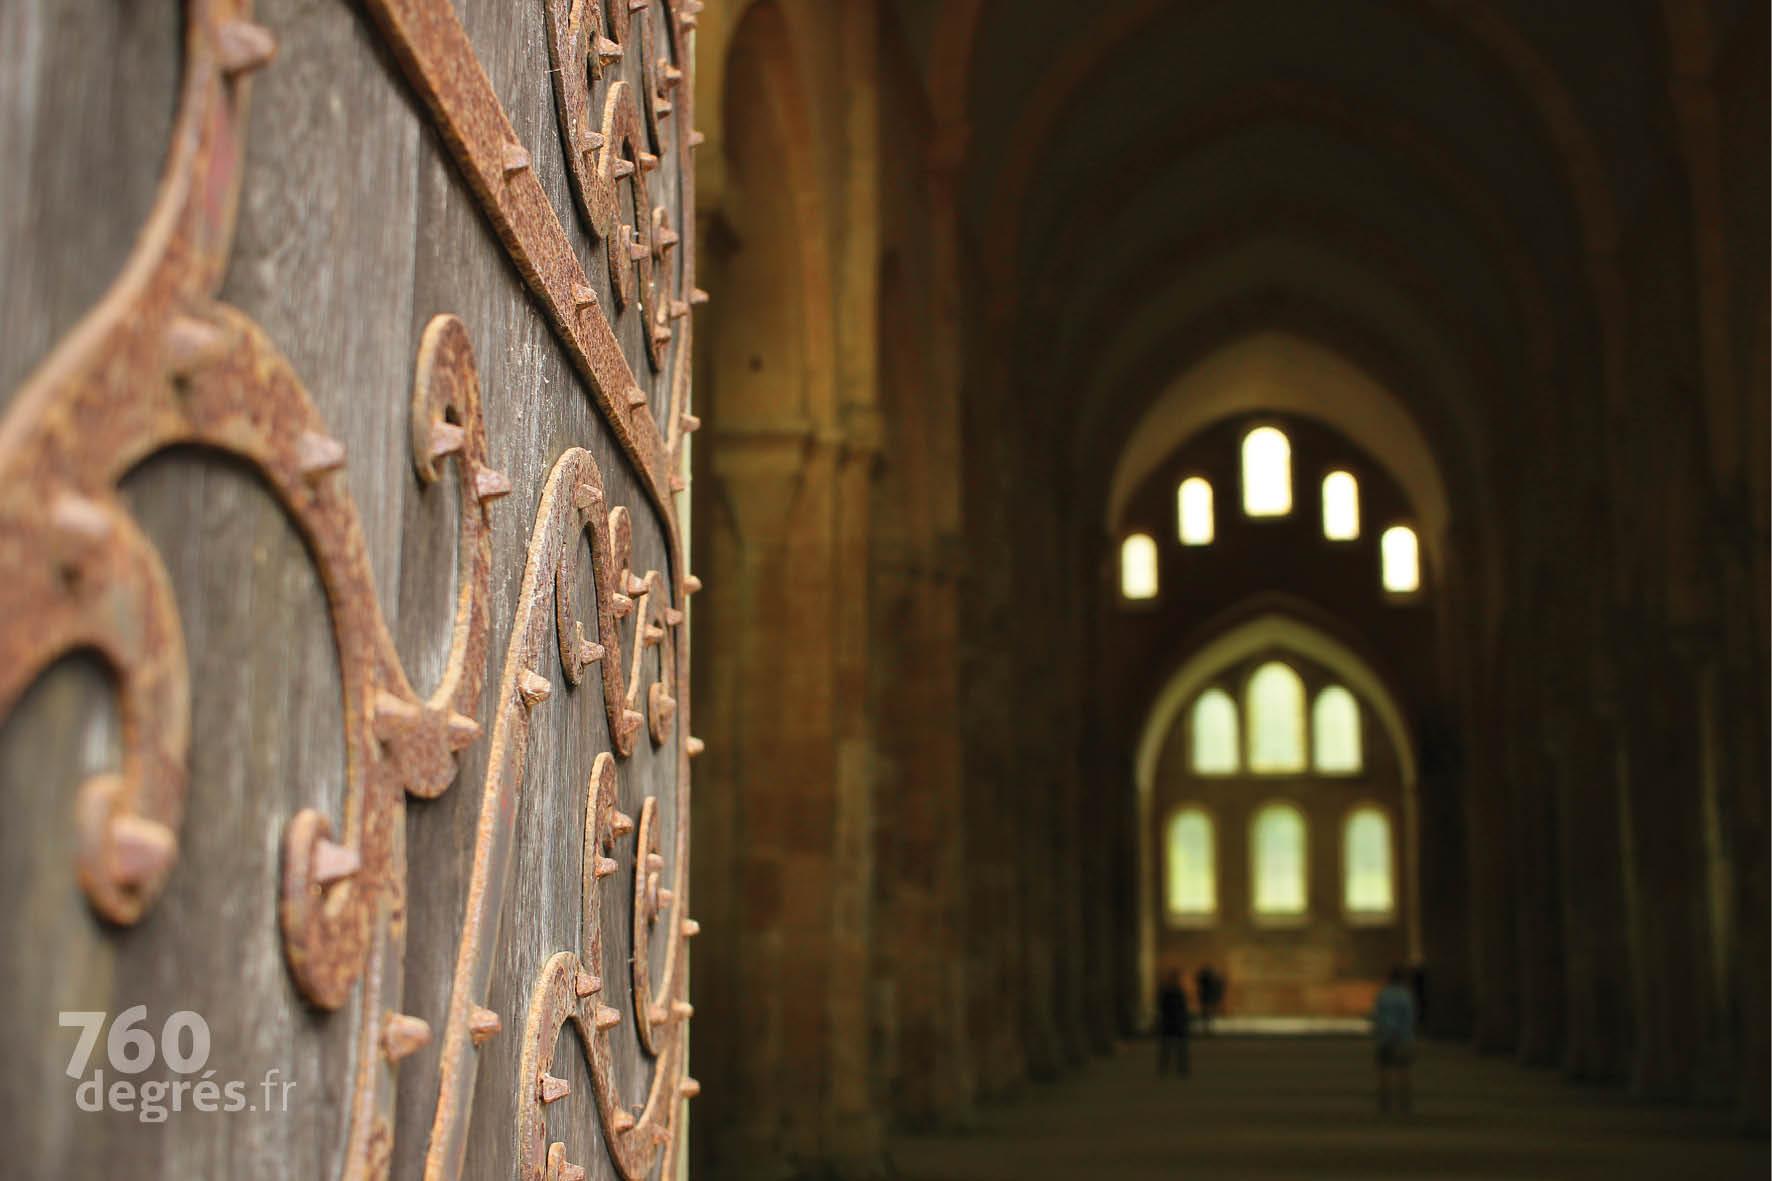 760degres-abbaye-fontenay-03